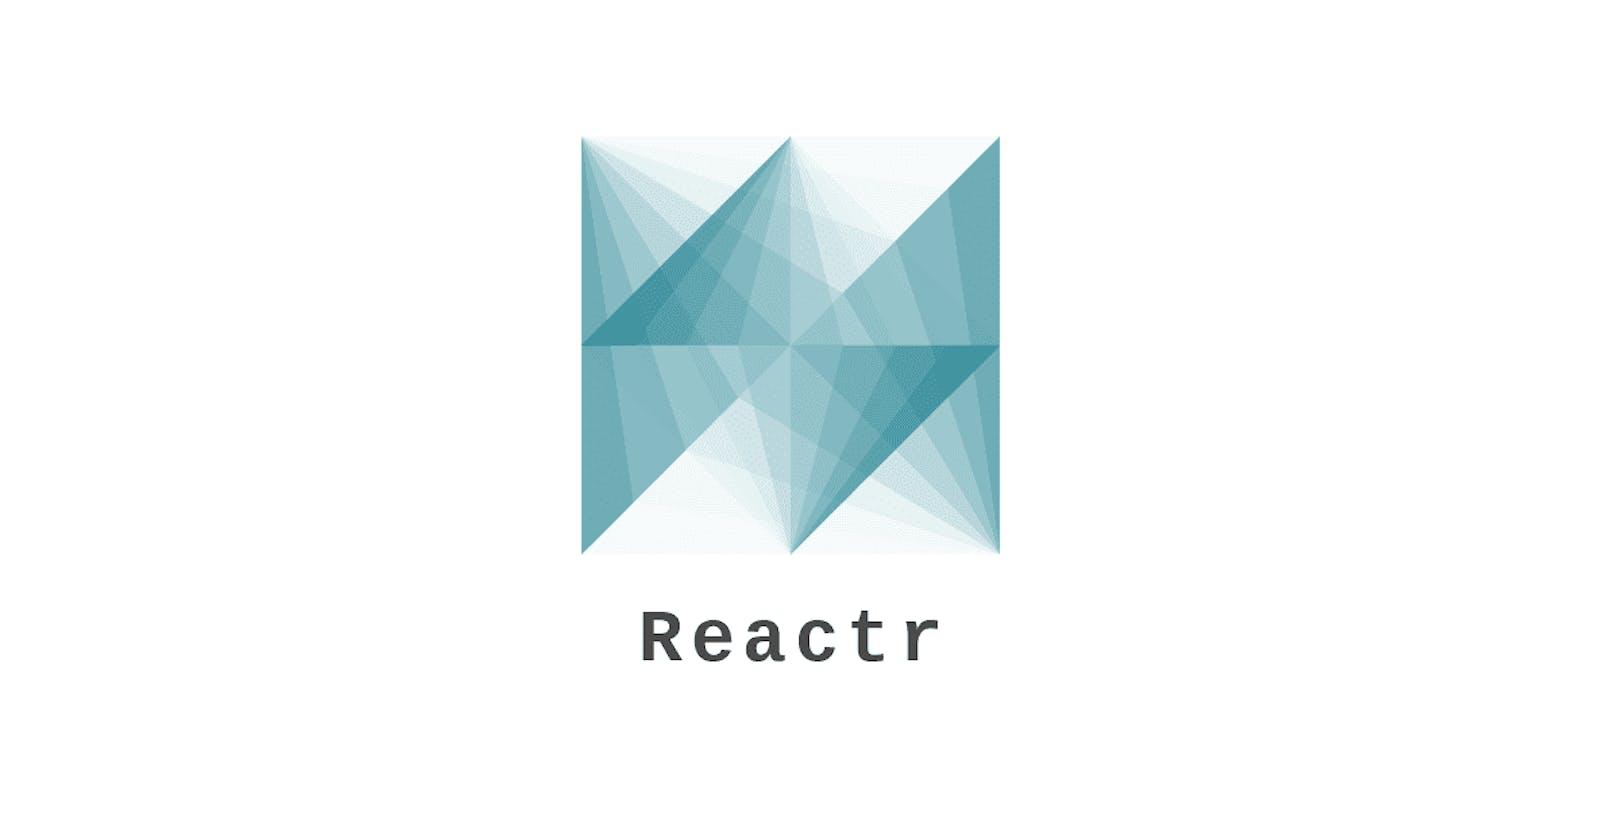 Introducing Reactr, the next generation function scheduler